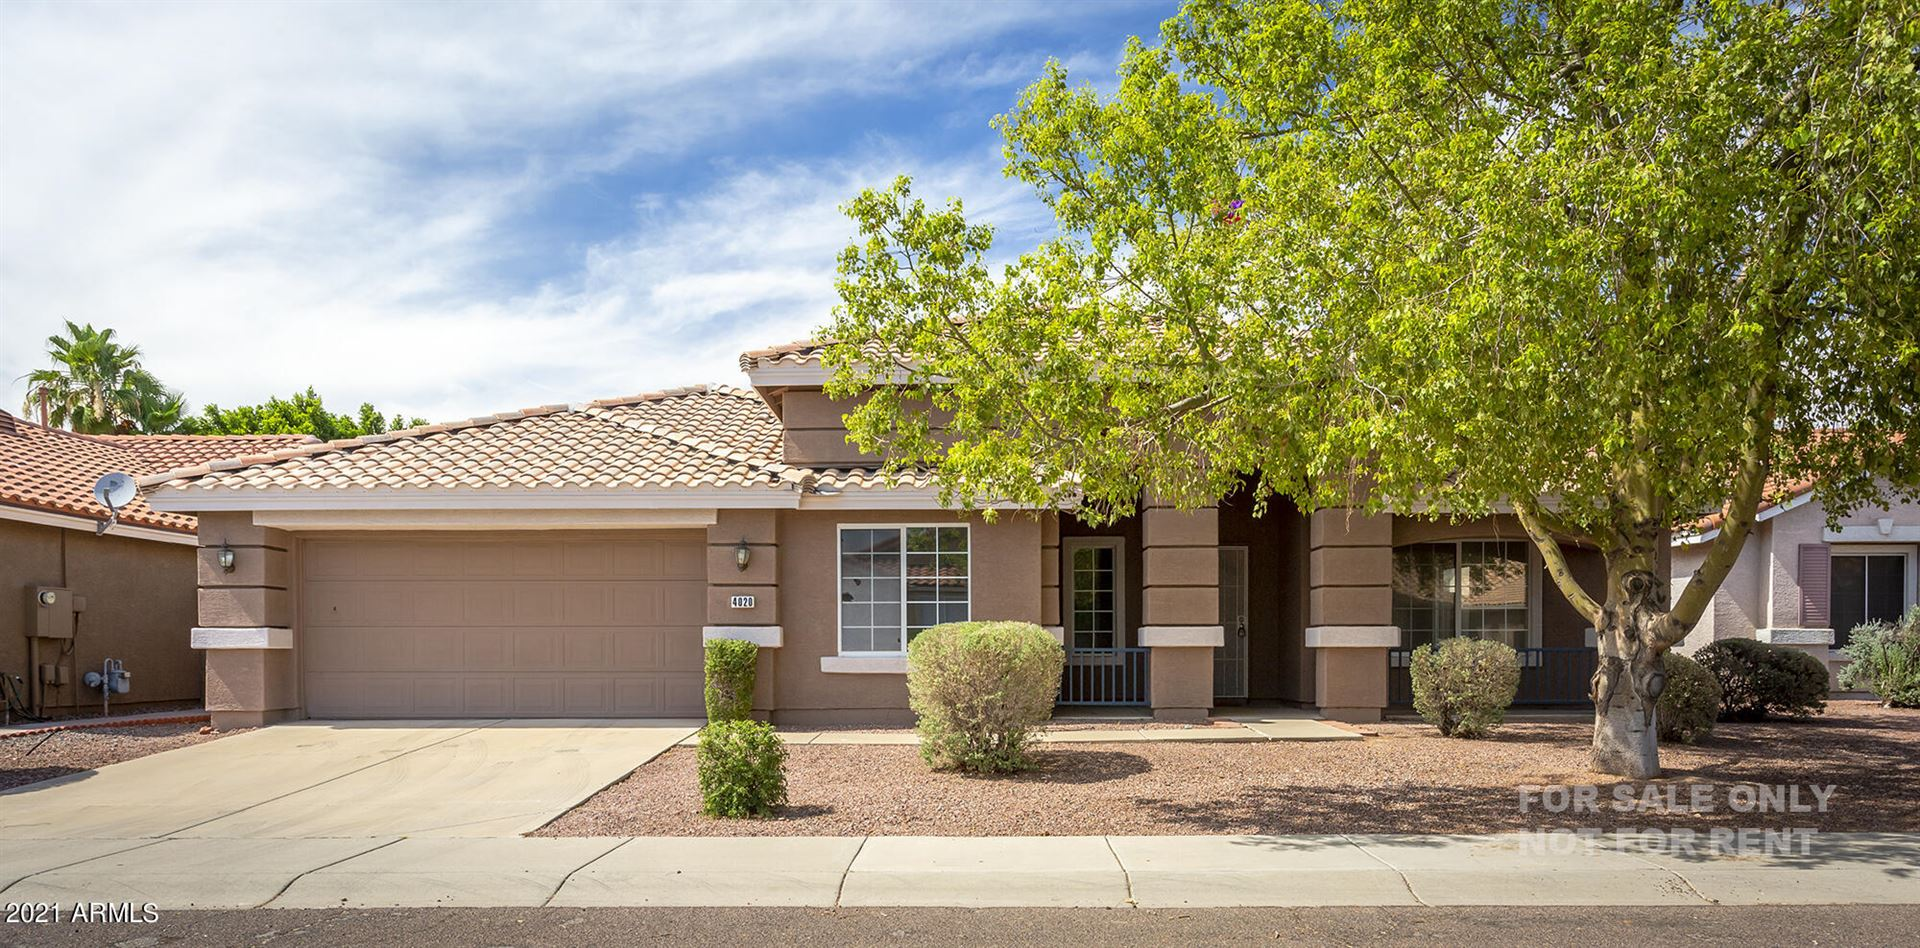 4020 W BLOOMFIELD Road, Phoenix, AZ 85029 - MLS#: 6248641